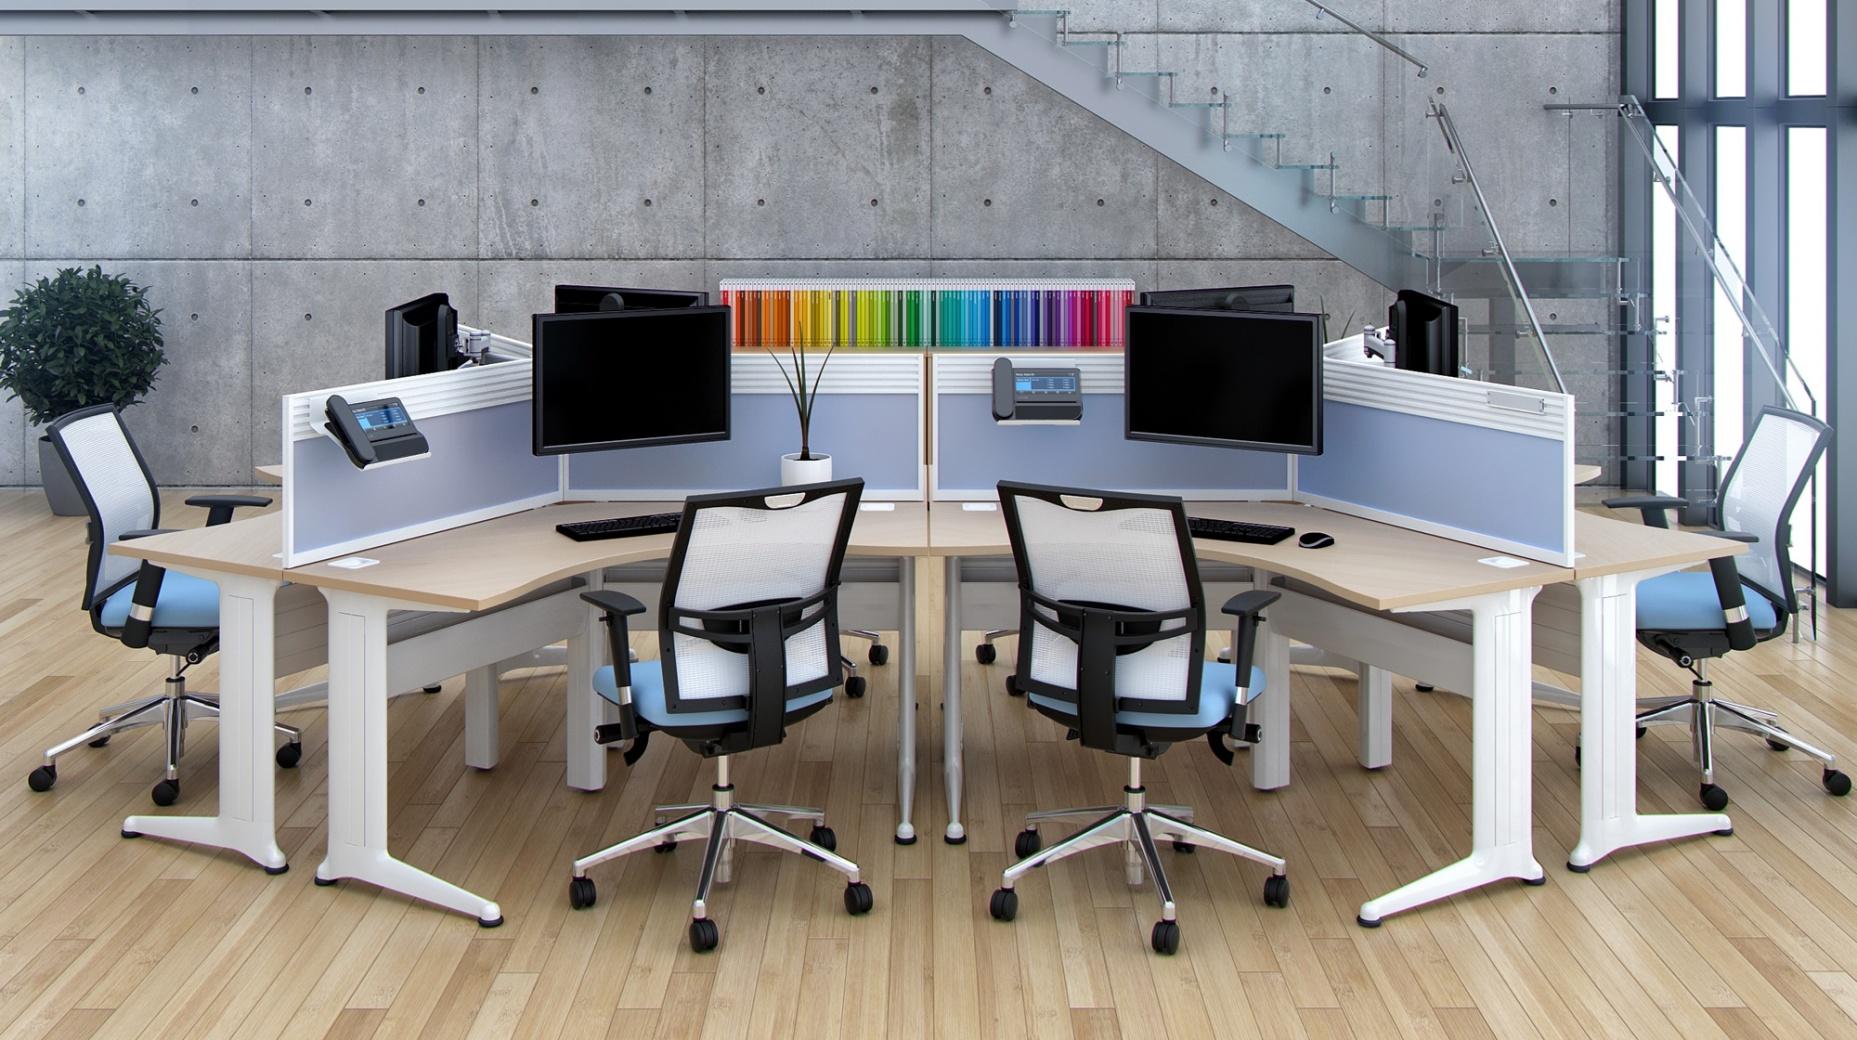 office desks dragonfly office interiors uk office